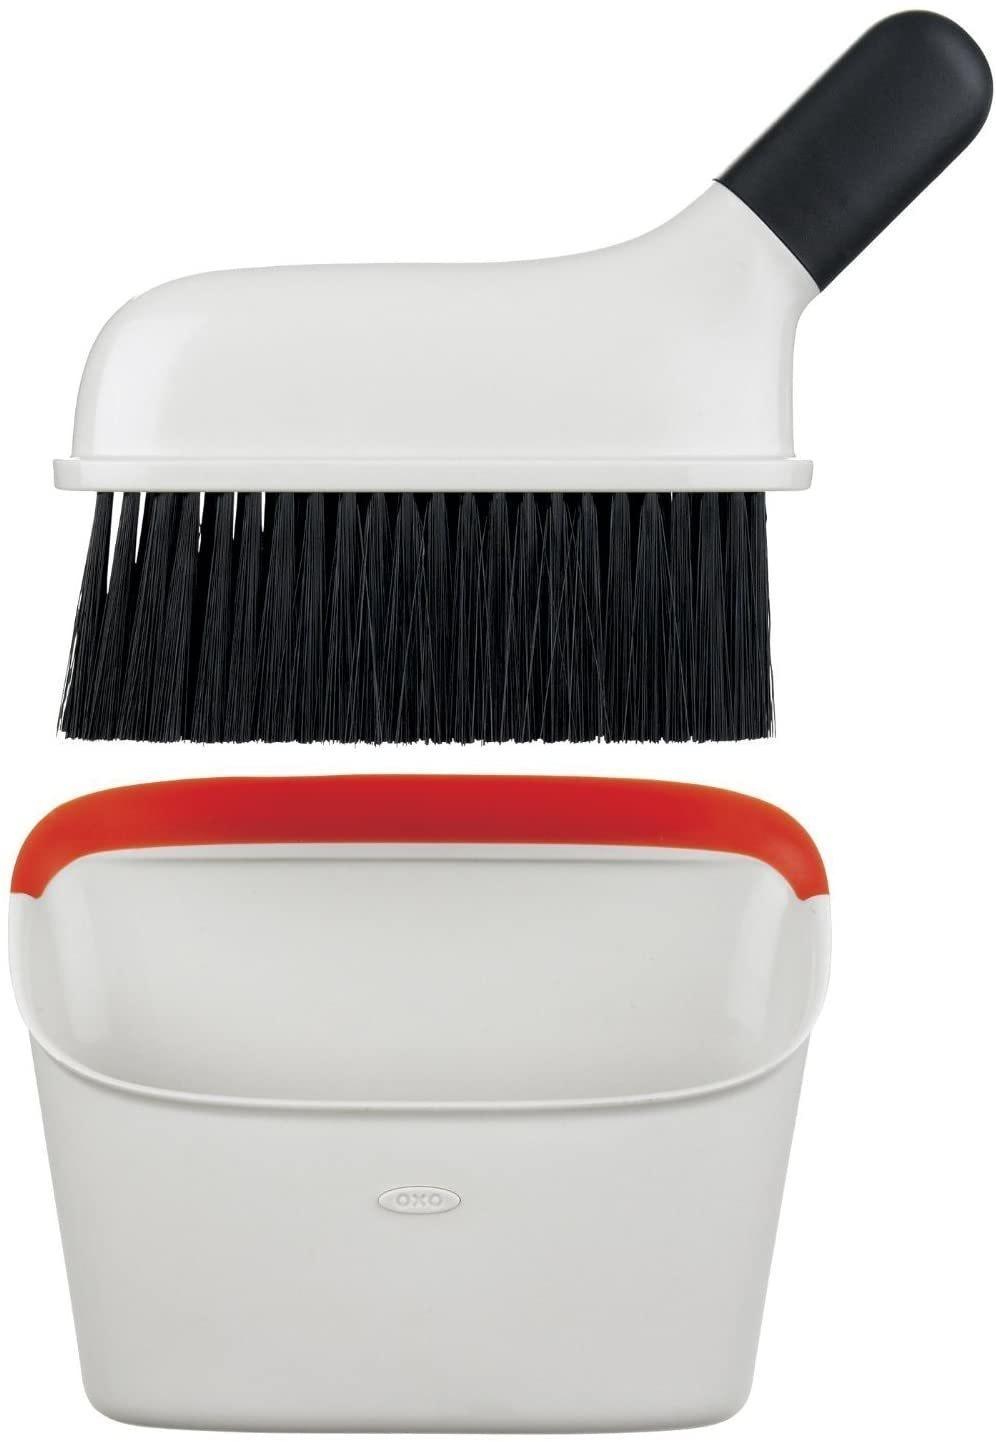 Oxo Little Dustpan & Broom